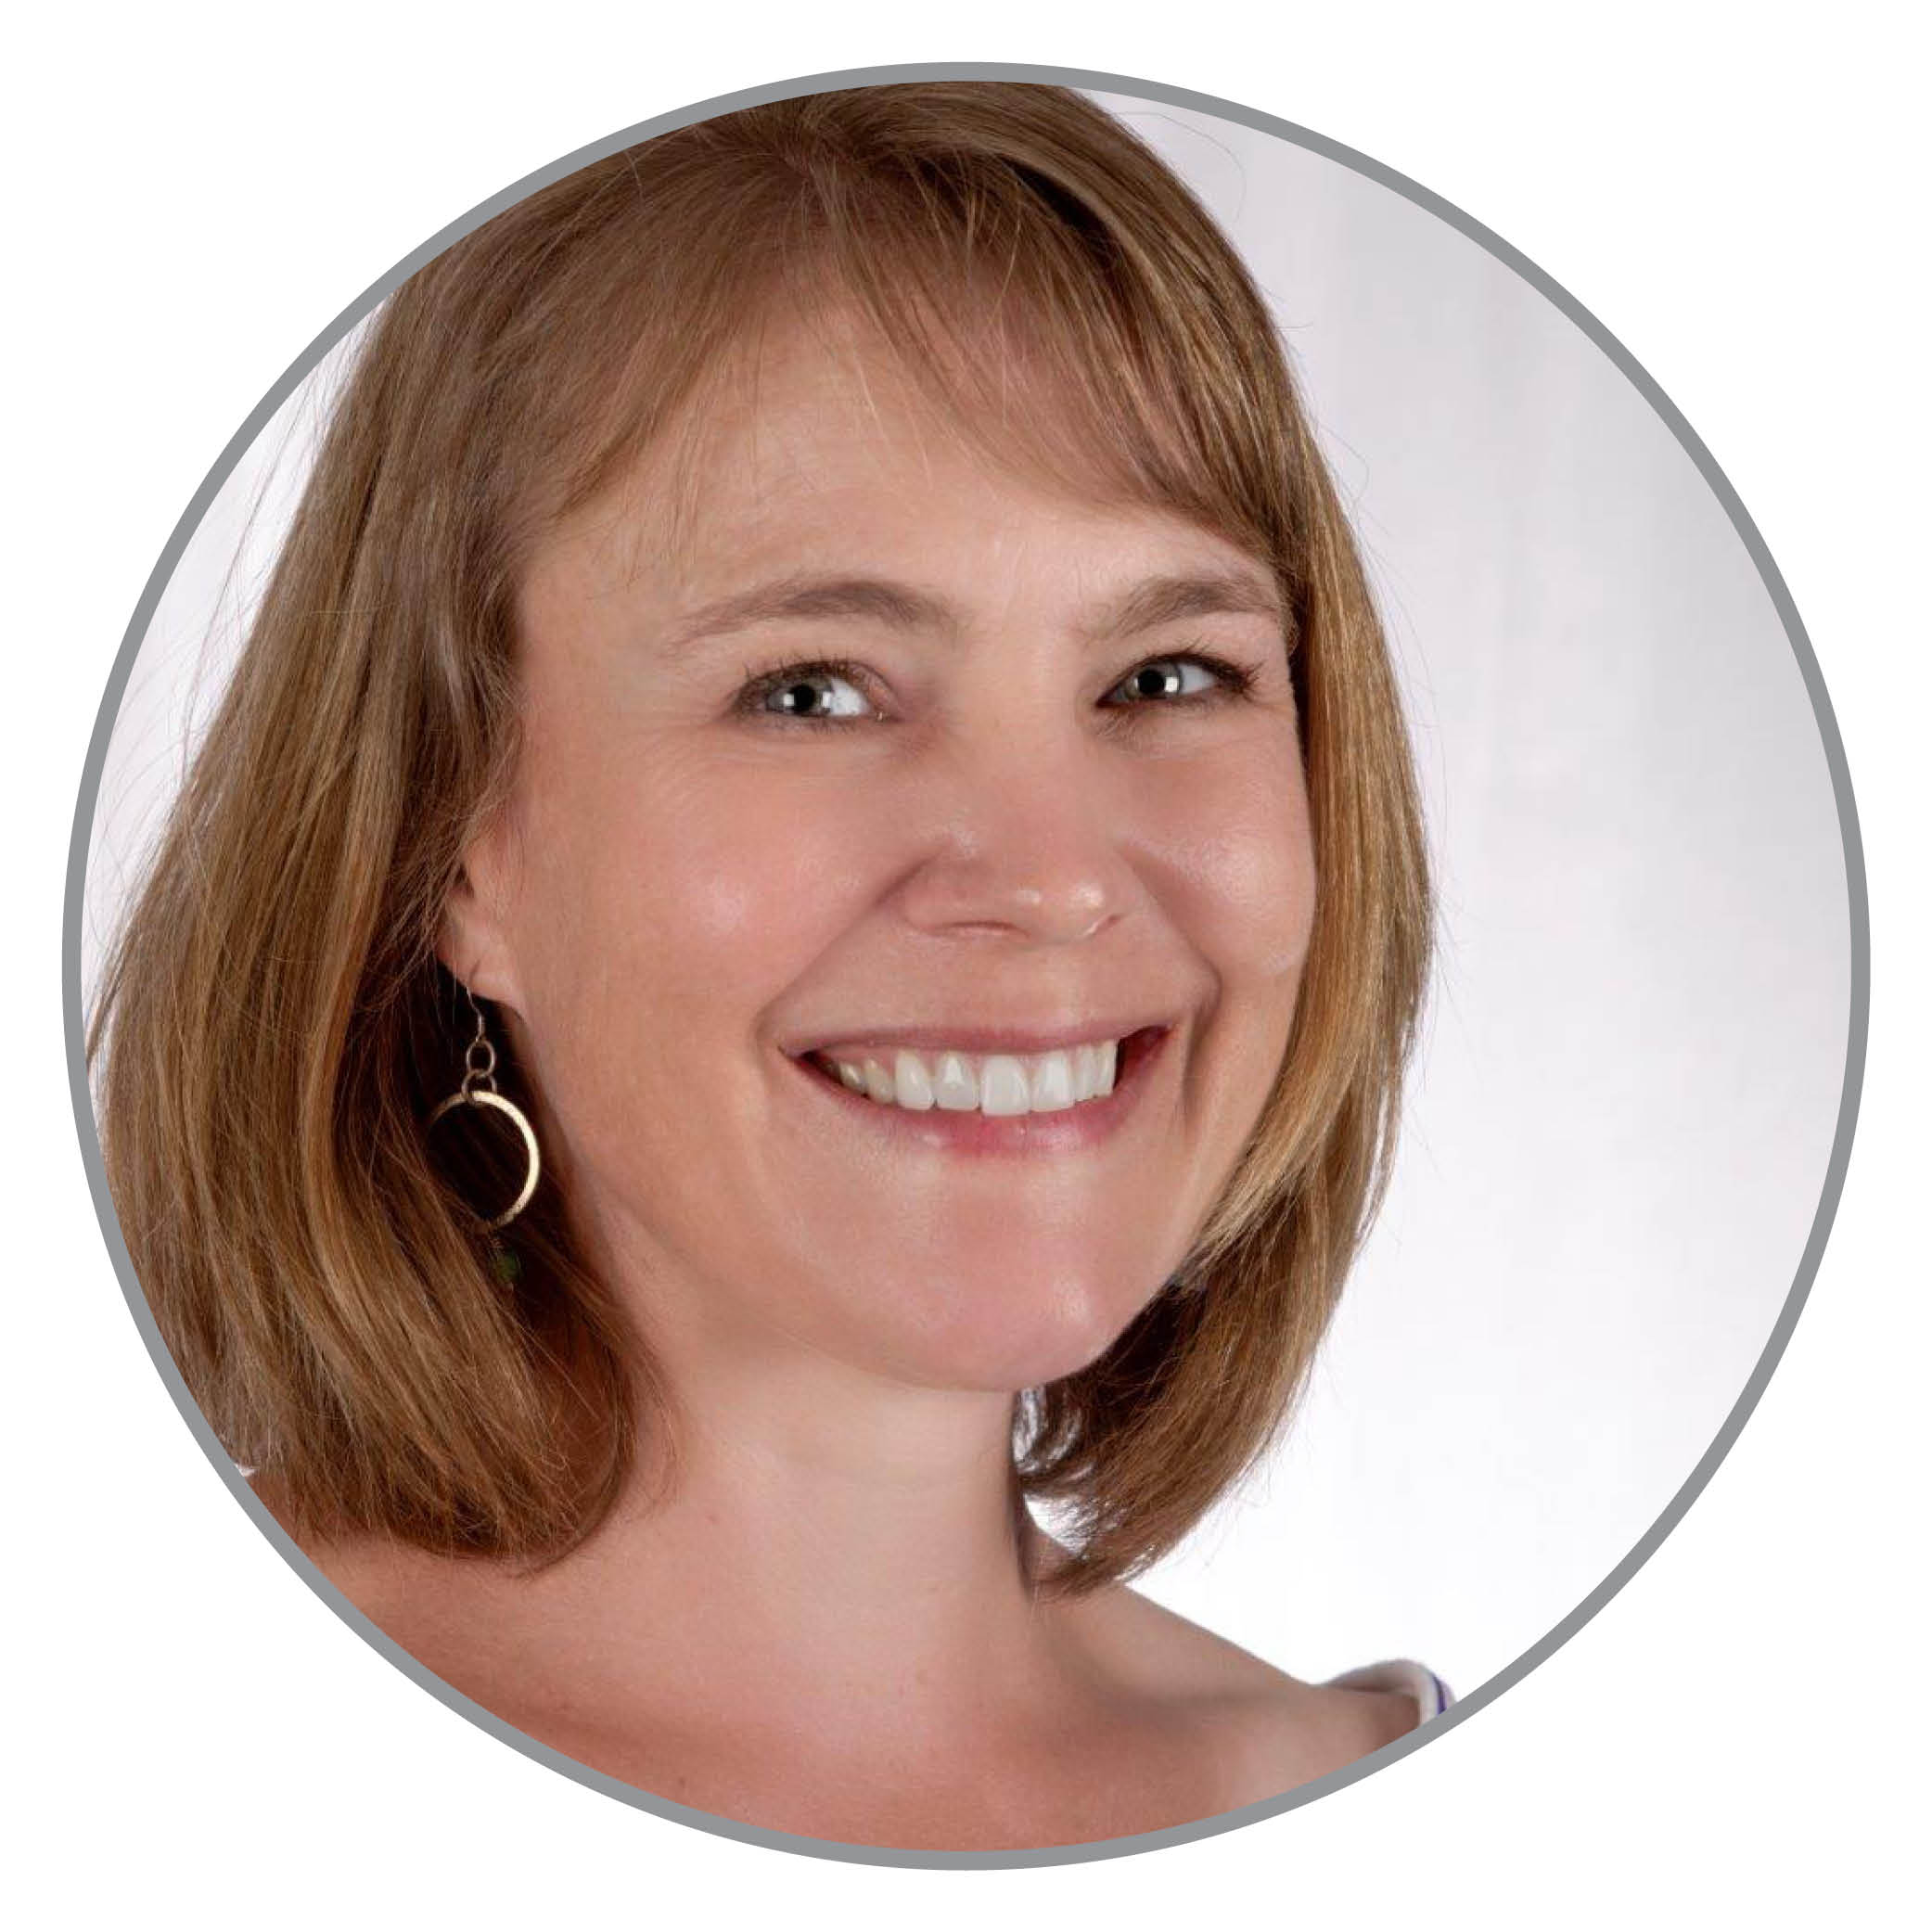 Wendy Holley-Boen - Senior Lecturer - Centre member and PLD facilitator